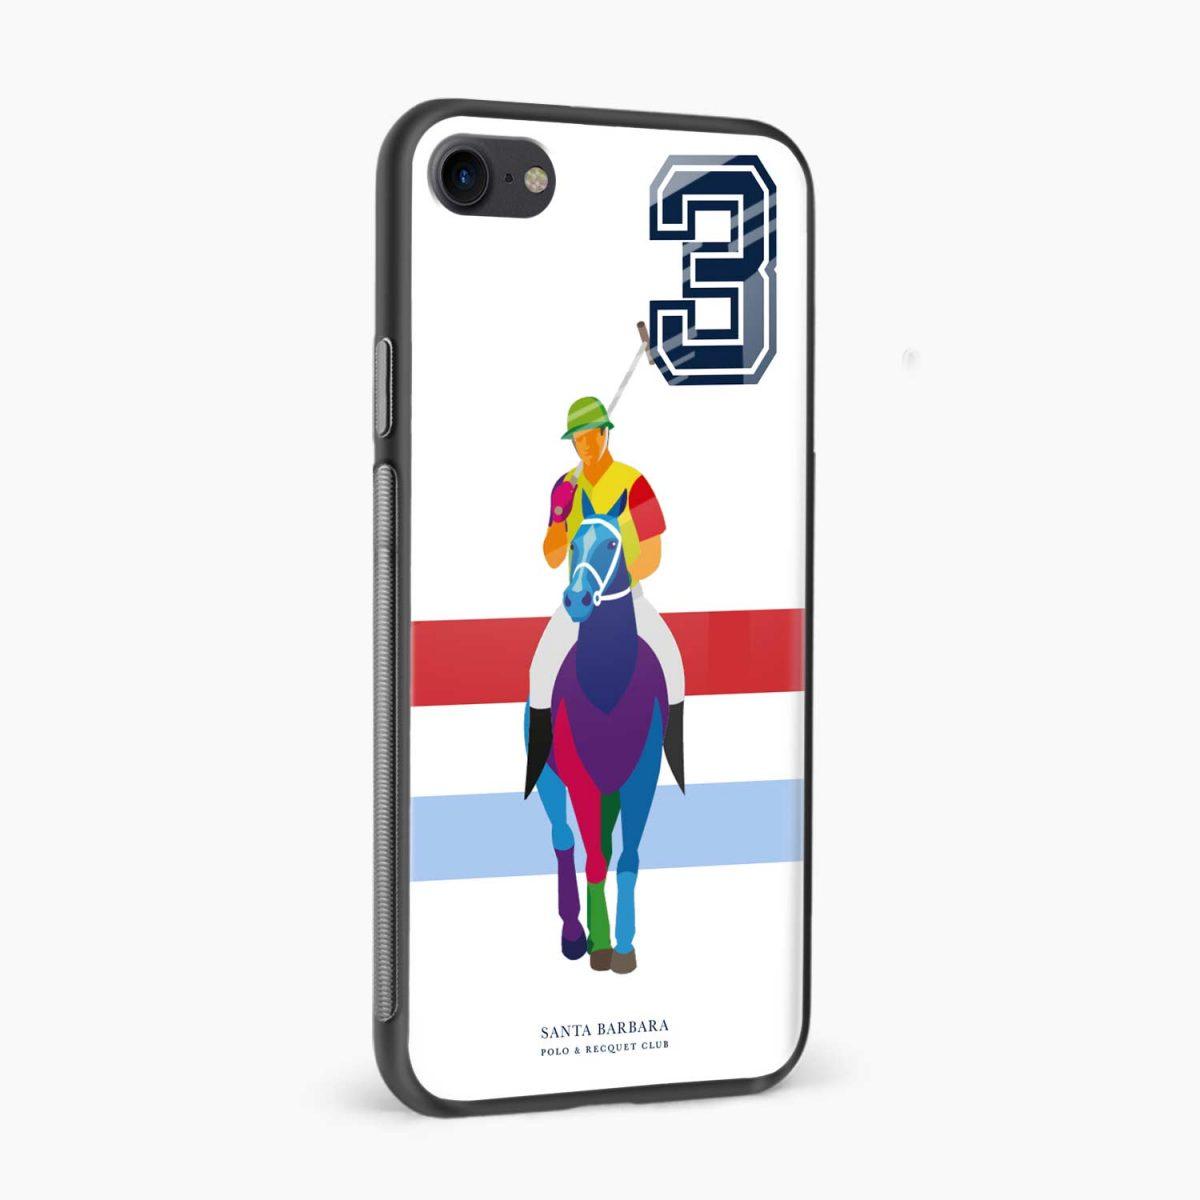 multicolor sant barbara polo side view apple iphone 6 7 8 se back cover